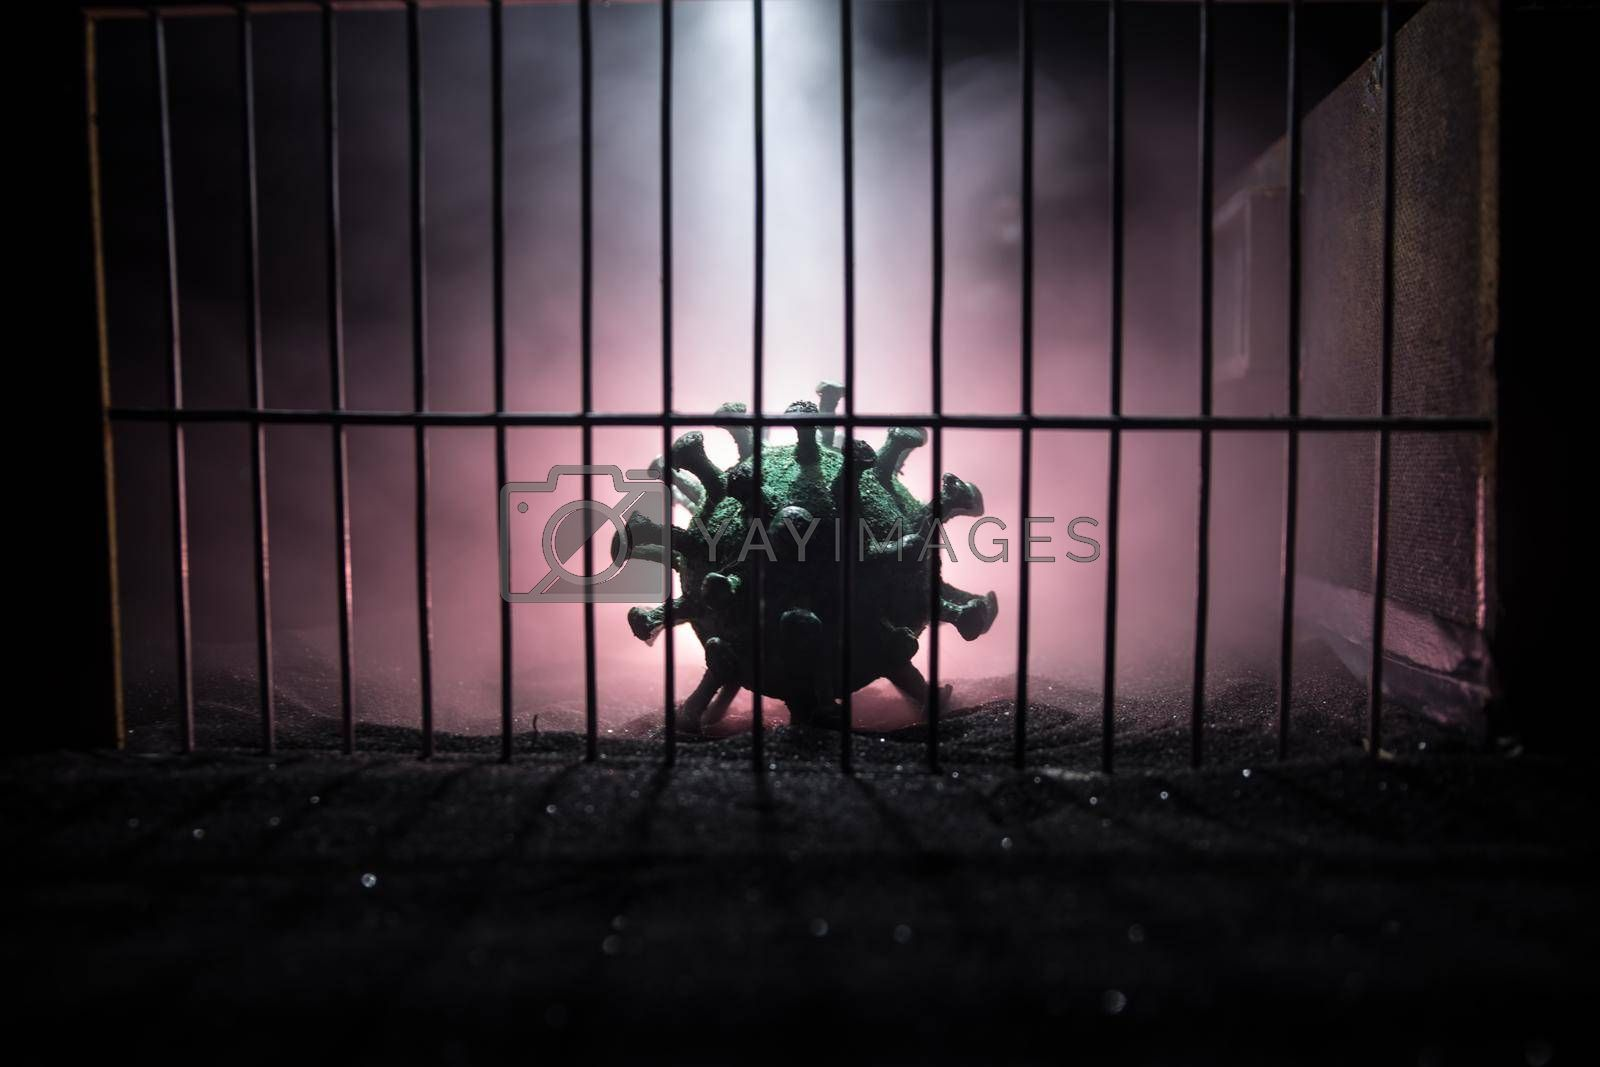 Corona virus lockdown creative concept. Corona virus novel miniature trapped inside old prison. Creative artwork decoration. Selective focus